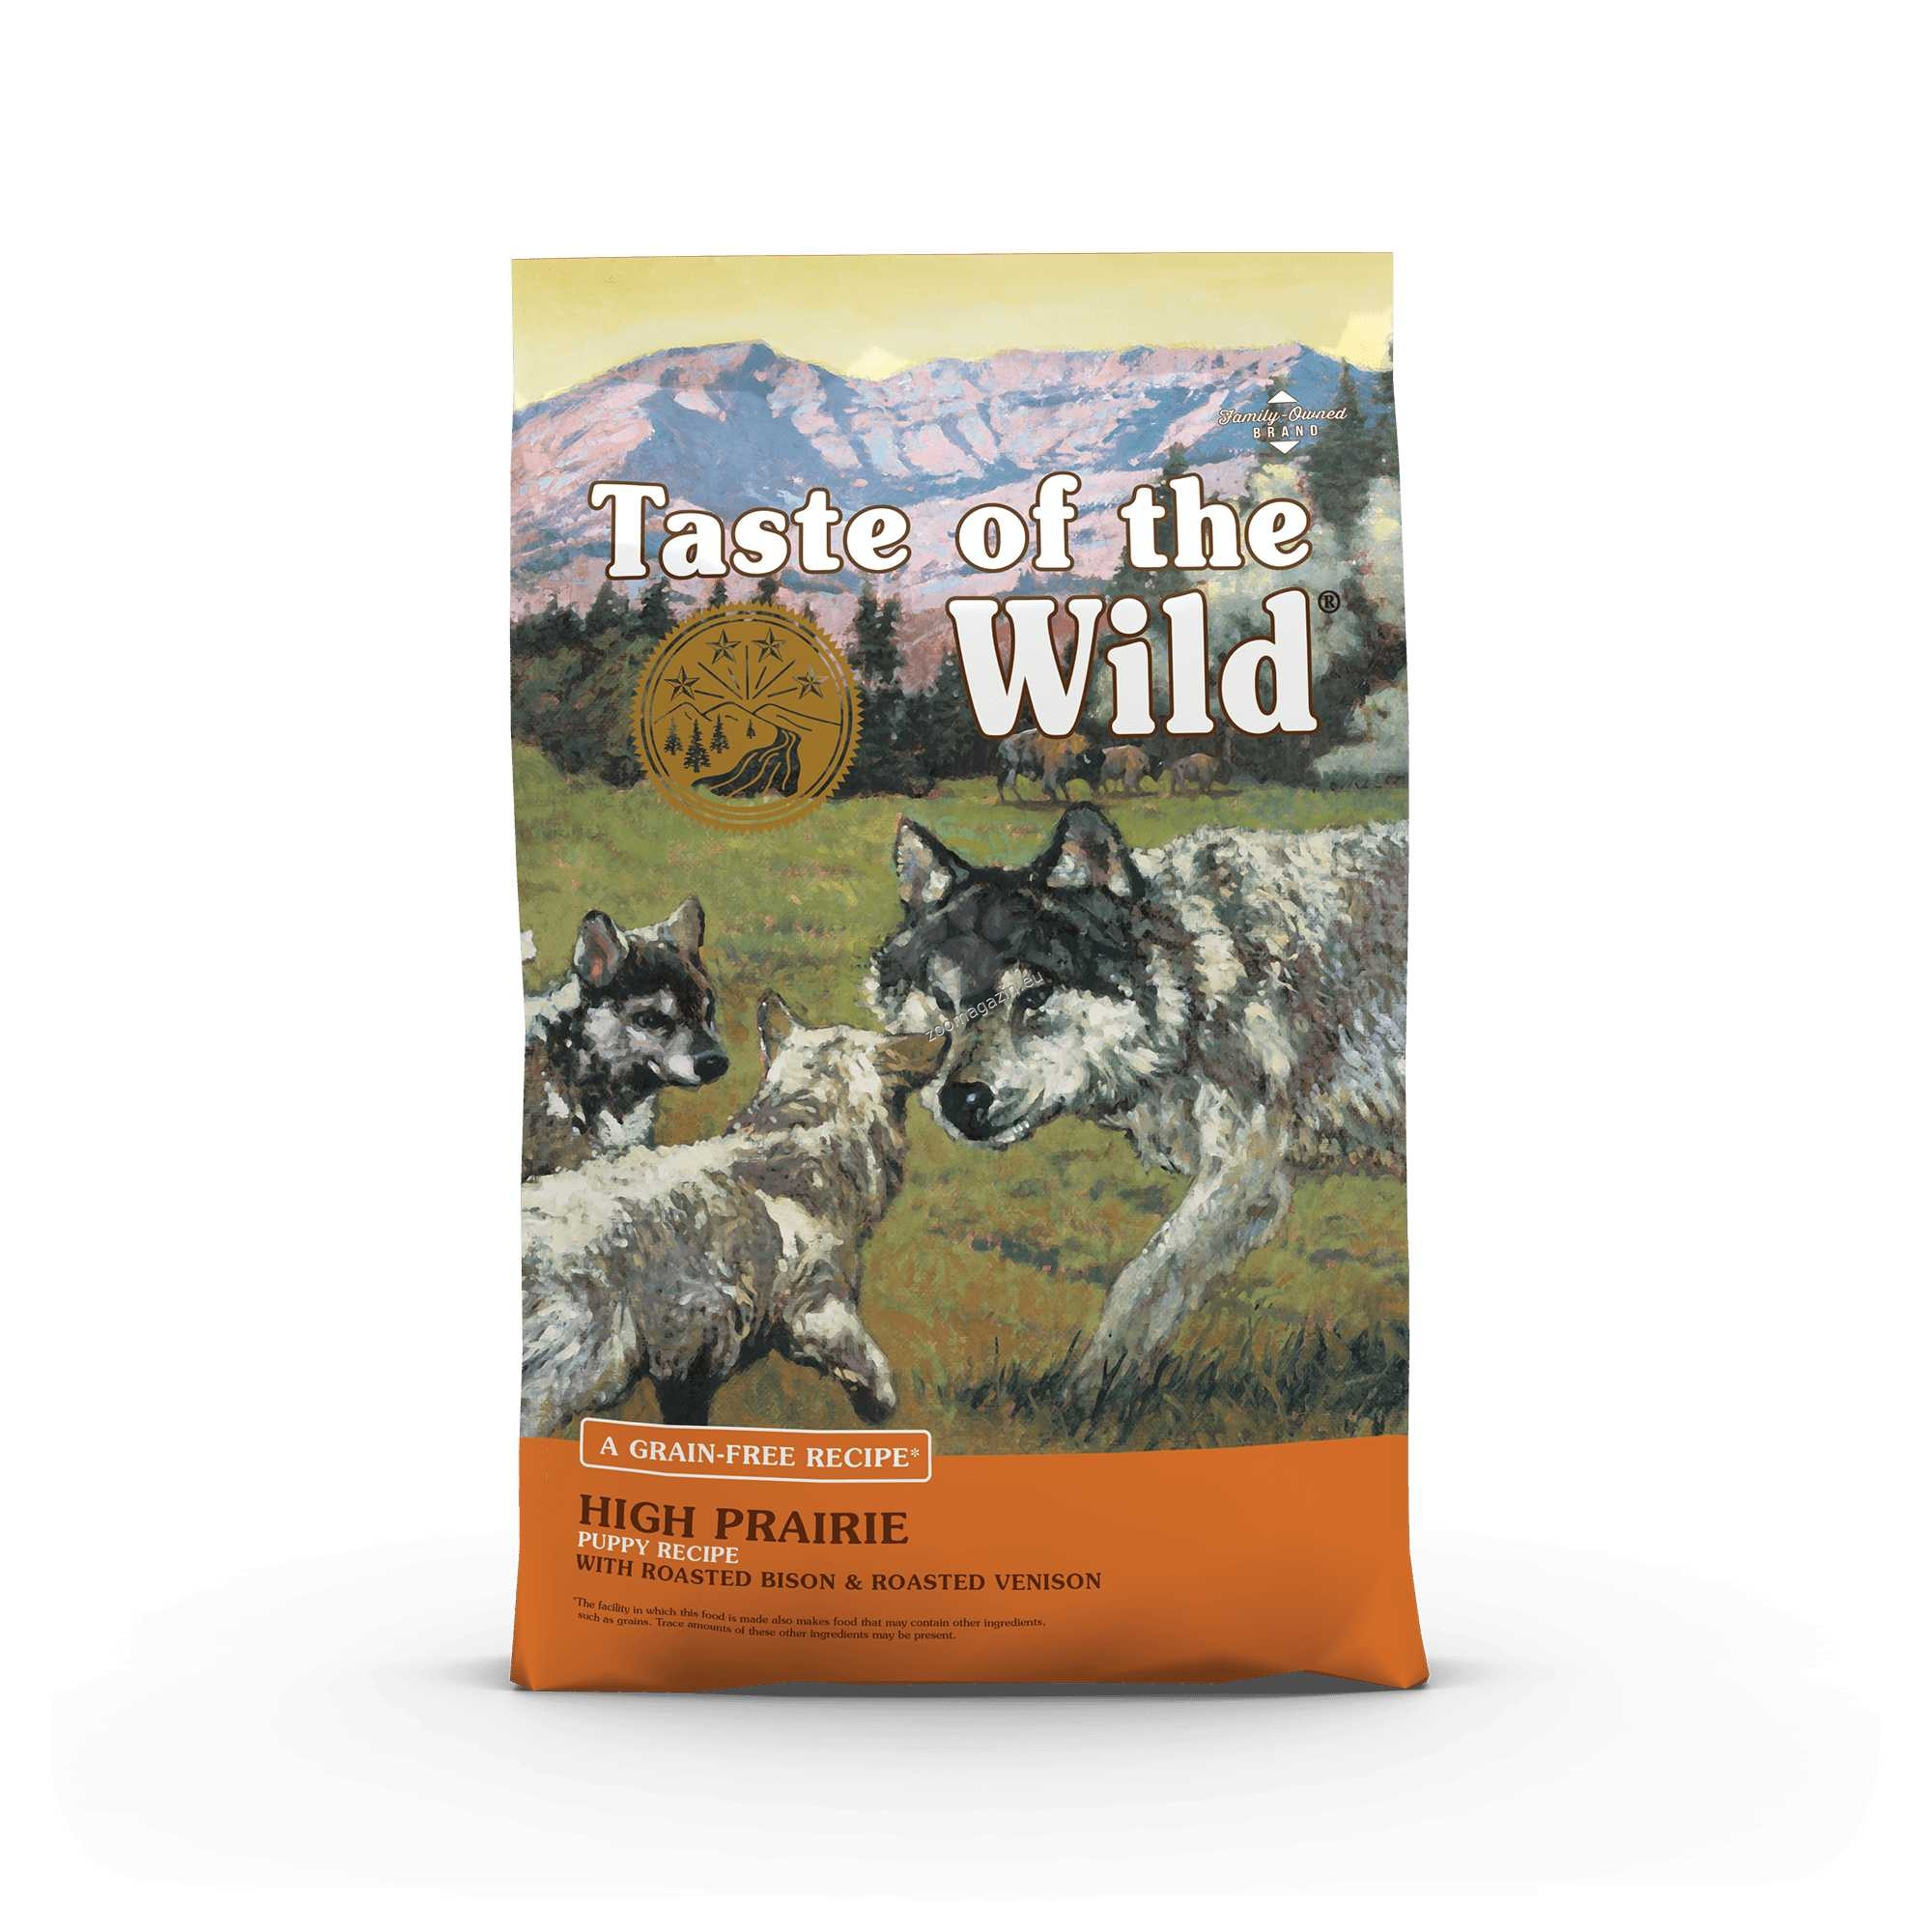 Taste of the Wild High Prairie Puppy with Bison & Roasted Venison - храна с бизонско и еленско месо, за подрастващи кучета от 1 до 12 месеца 12.2 кг.